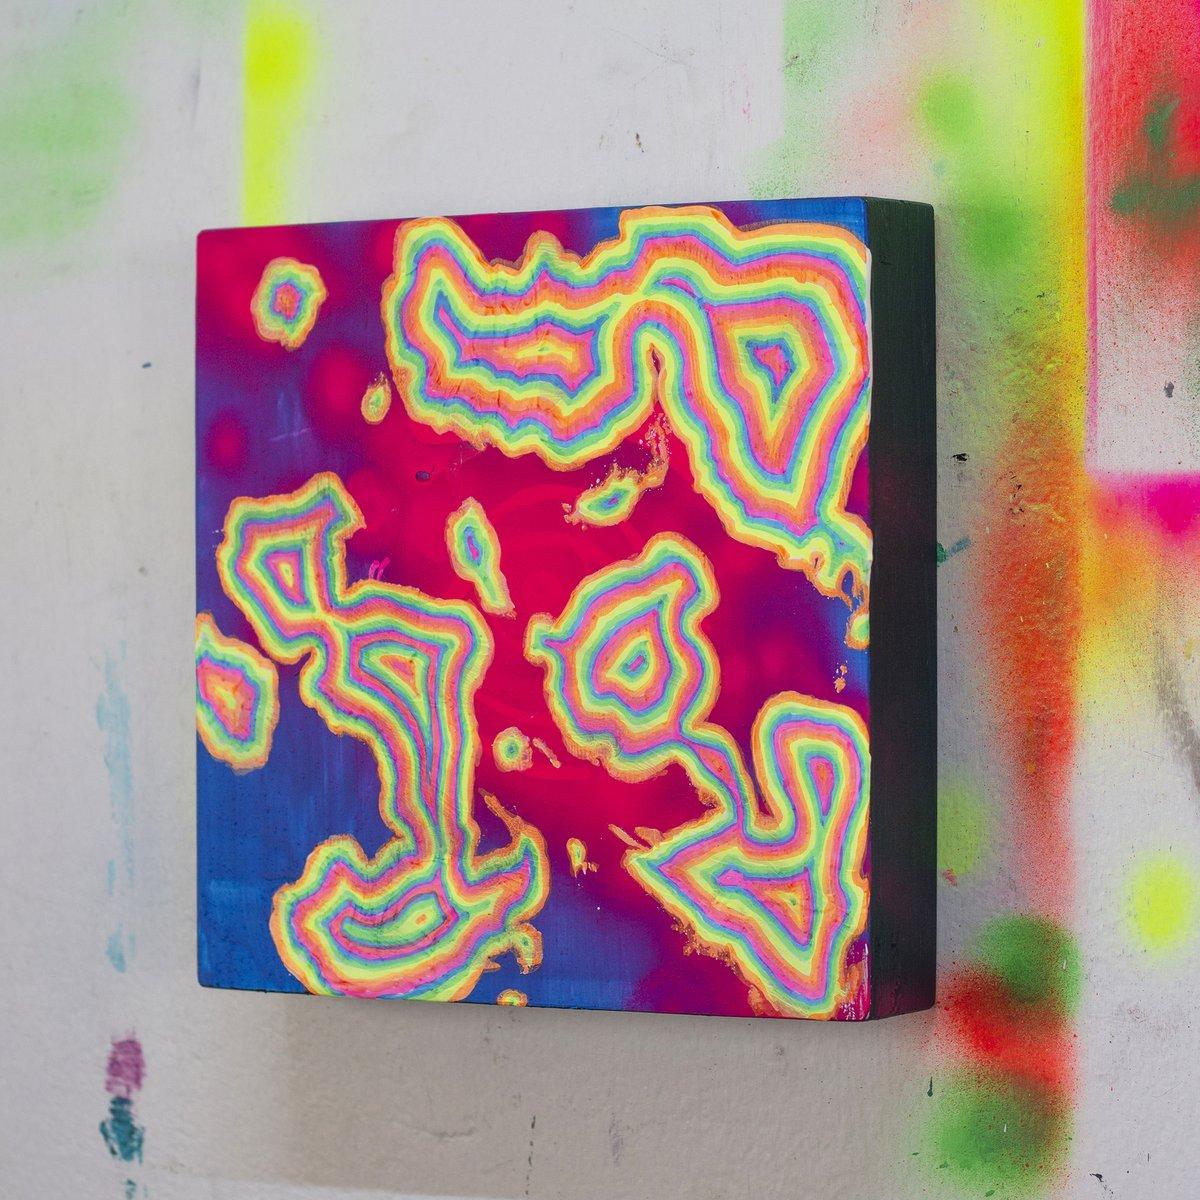 Little fluo rainbow ponds baby painting  - #painting #uvpainting #acrylicpainting #contemporaryart #rainbowpunk #arteobjeto #abstractpainting #stayabstract #visualalchemy #glitchpainting #glitch #glitchart #visualchemy #internetart #webpunk #audacity #tradigitalartpic.twitter.com/FfiYOX7hD3